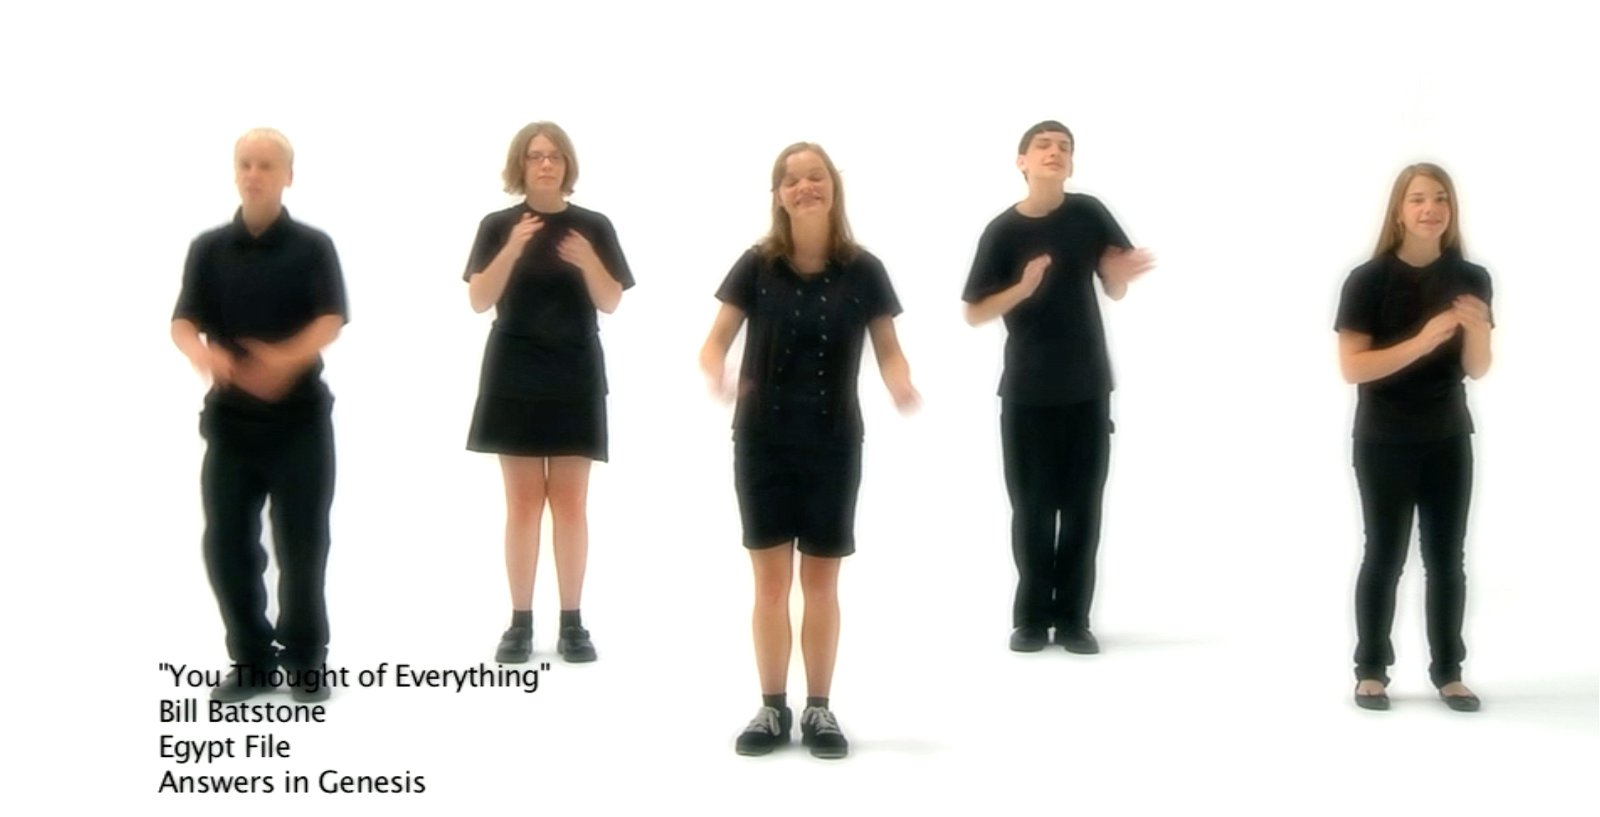 You Thought of Everything (Lyrics Video)